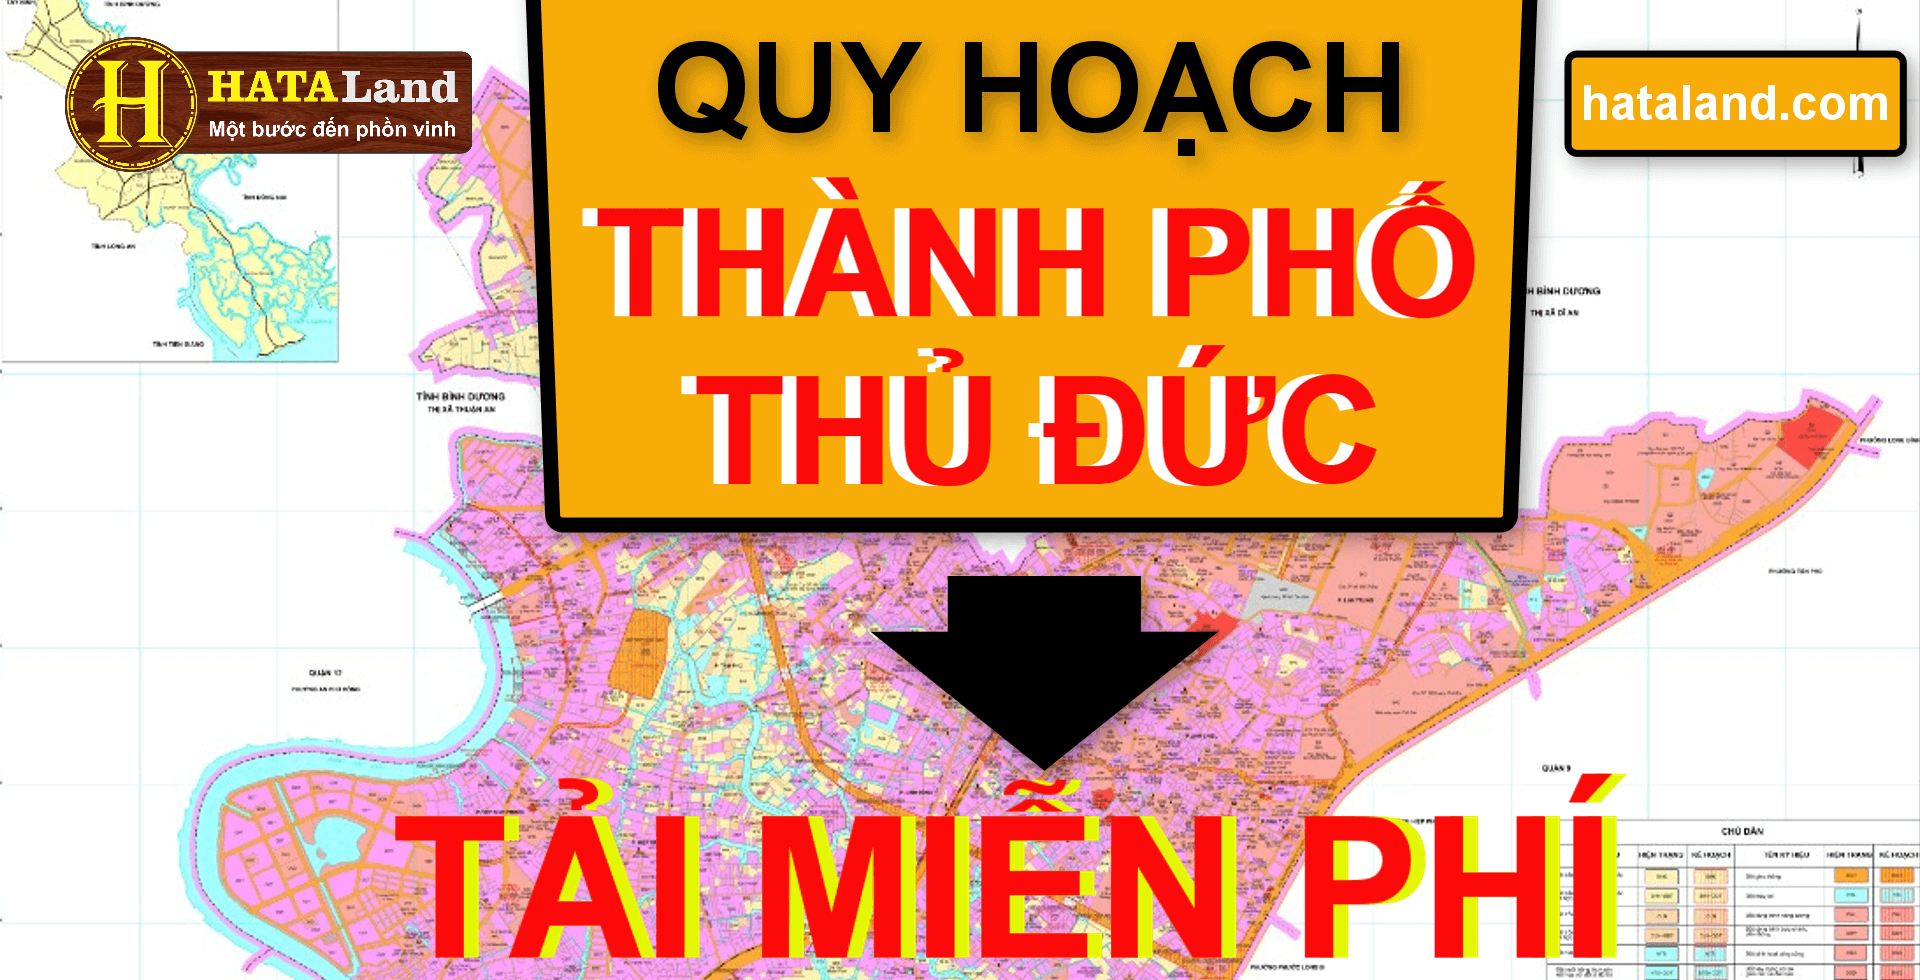 BAN-DO-DIEU-CHINH-QUY-HOACH-THANH-PHO-THU-DUC-TAI-MIEN-PHI